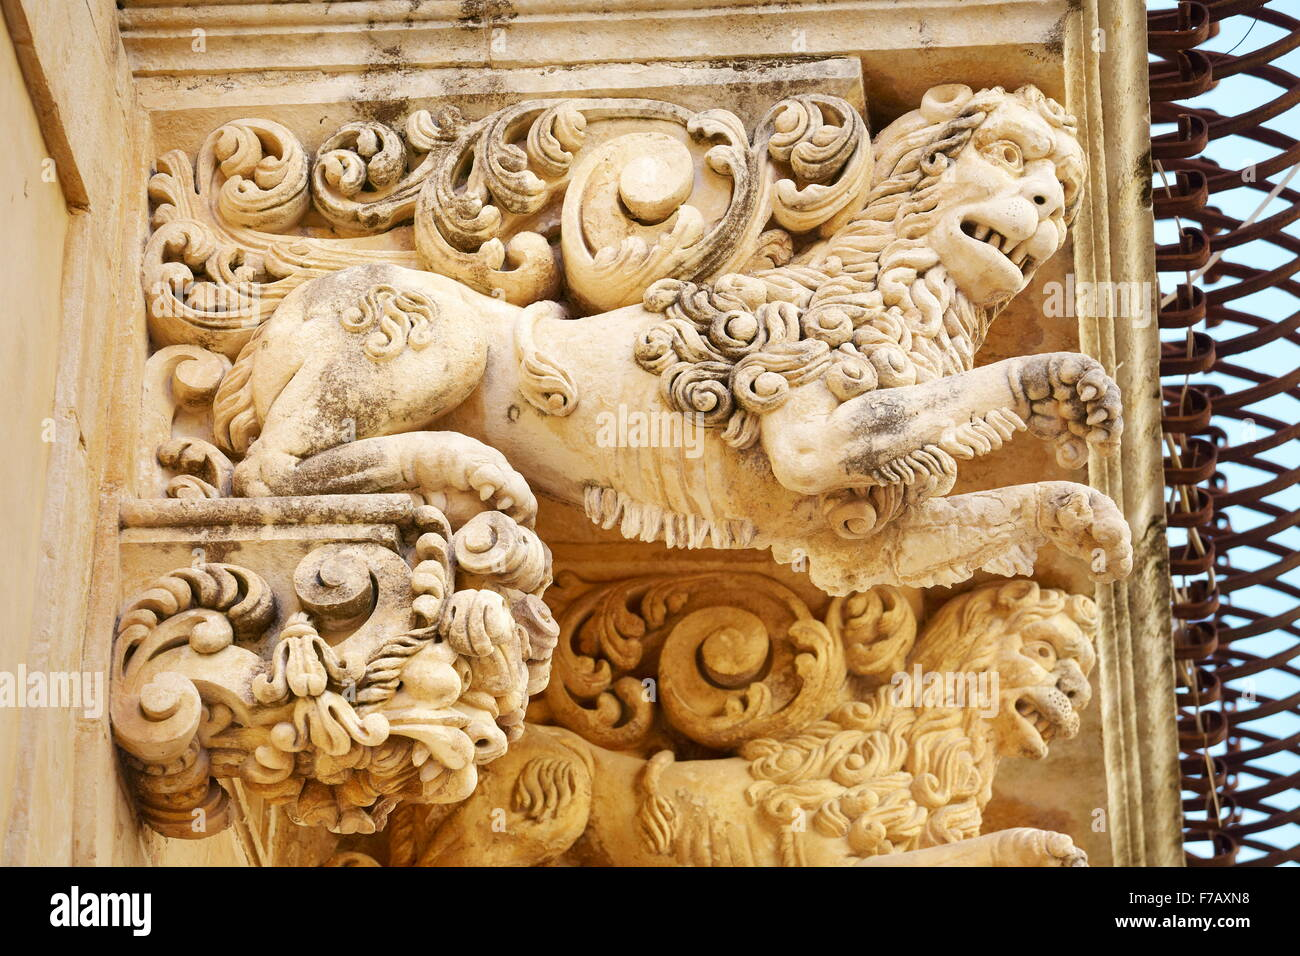 Noto - baroque details of balcony at the Palazzo Villadorata (Palazzo Nicolaci), Noto Old Town, Sicily, Italy UNESCO - Stock Image